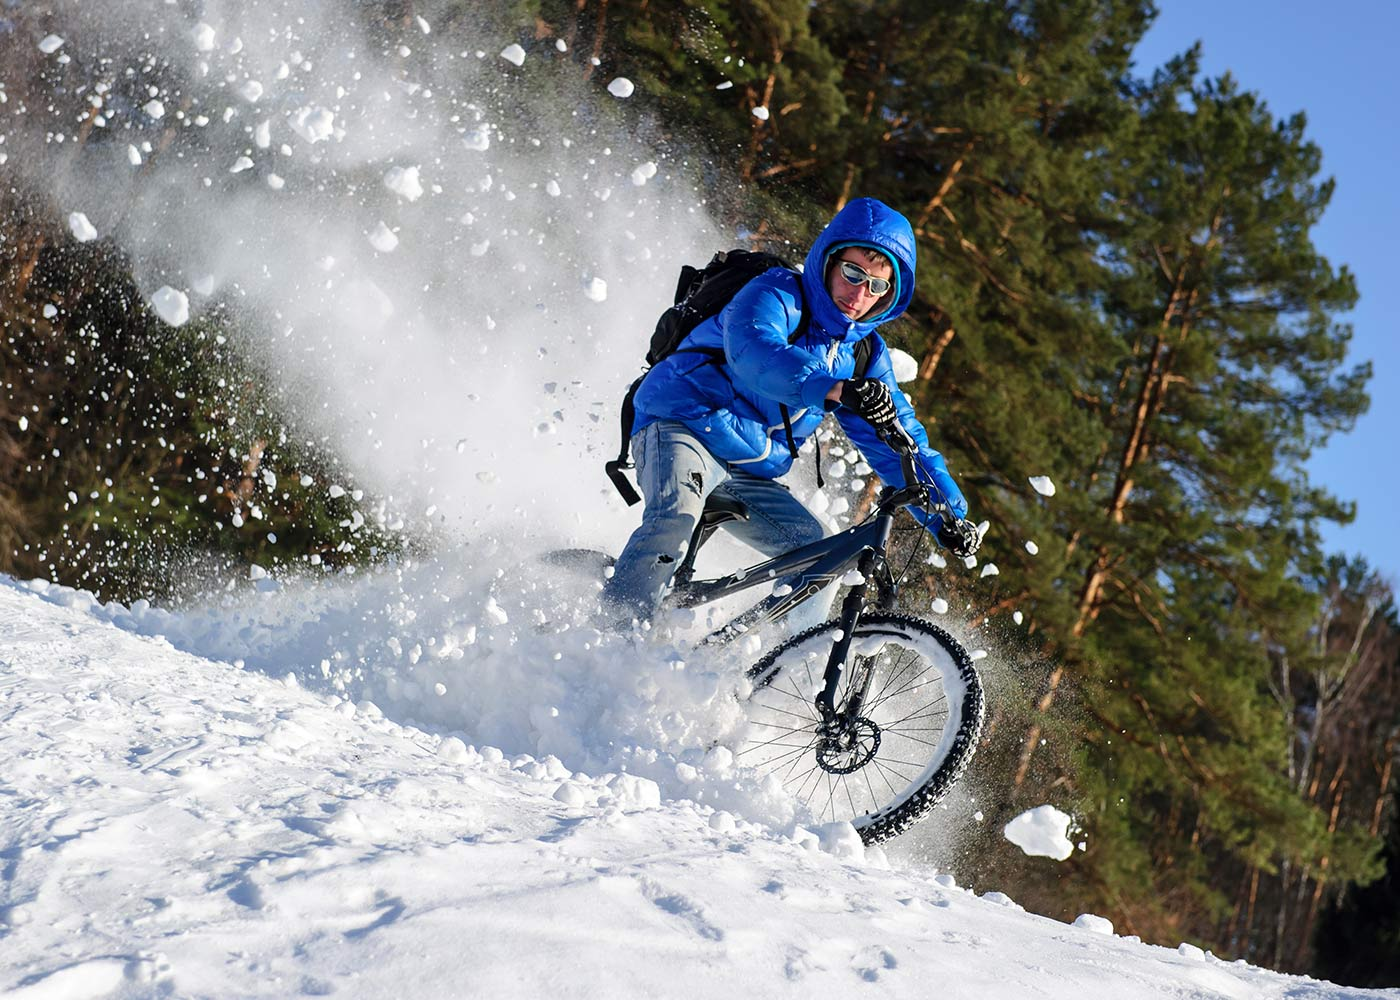 Mountain Bike riding in snow